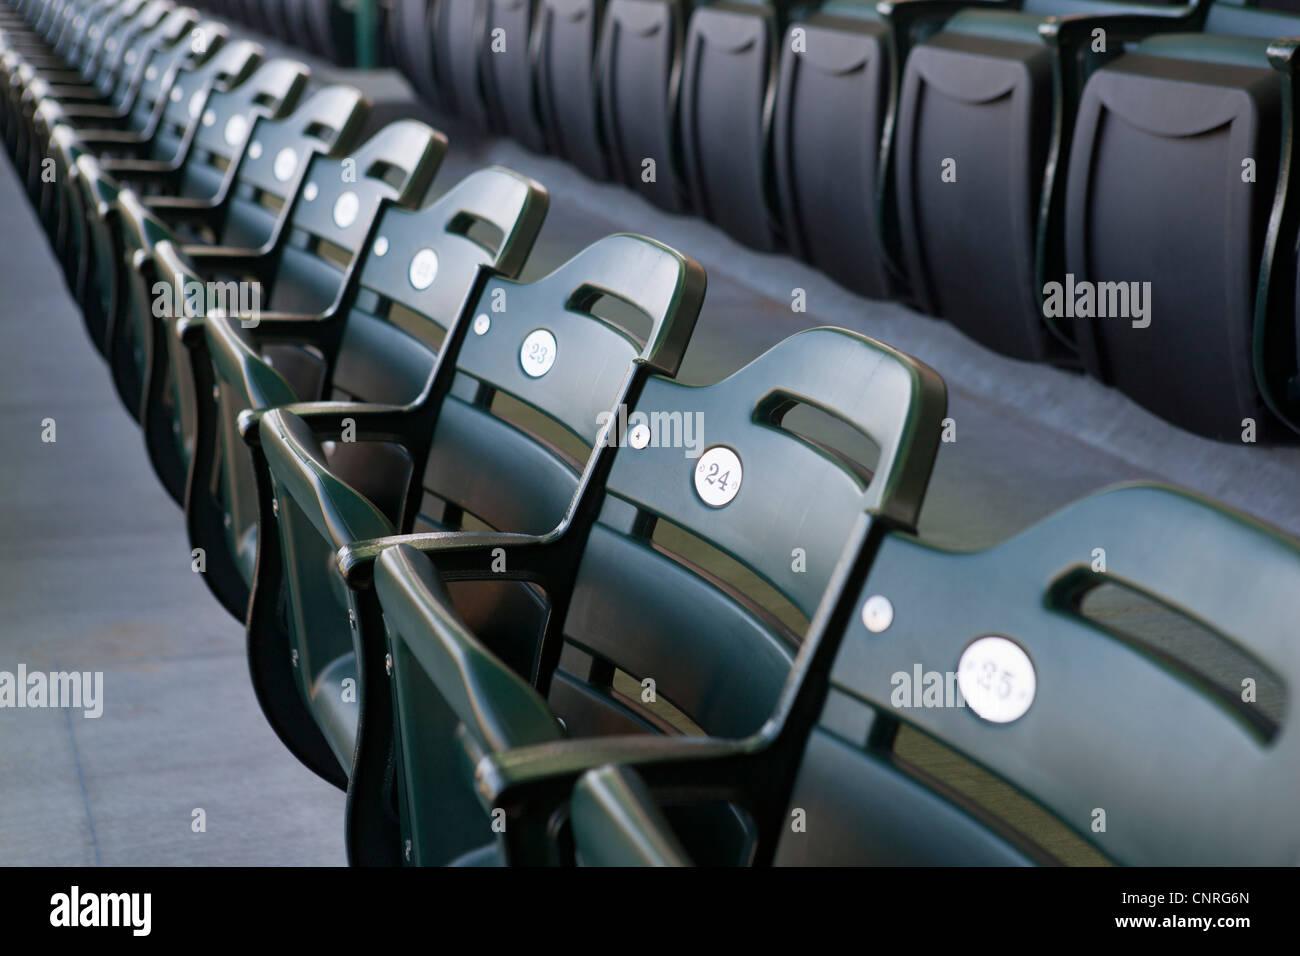 Empty folding seats - Stock Image